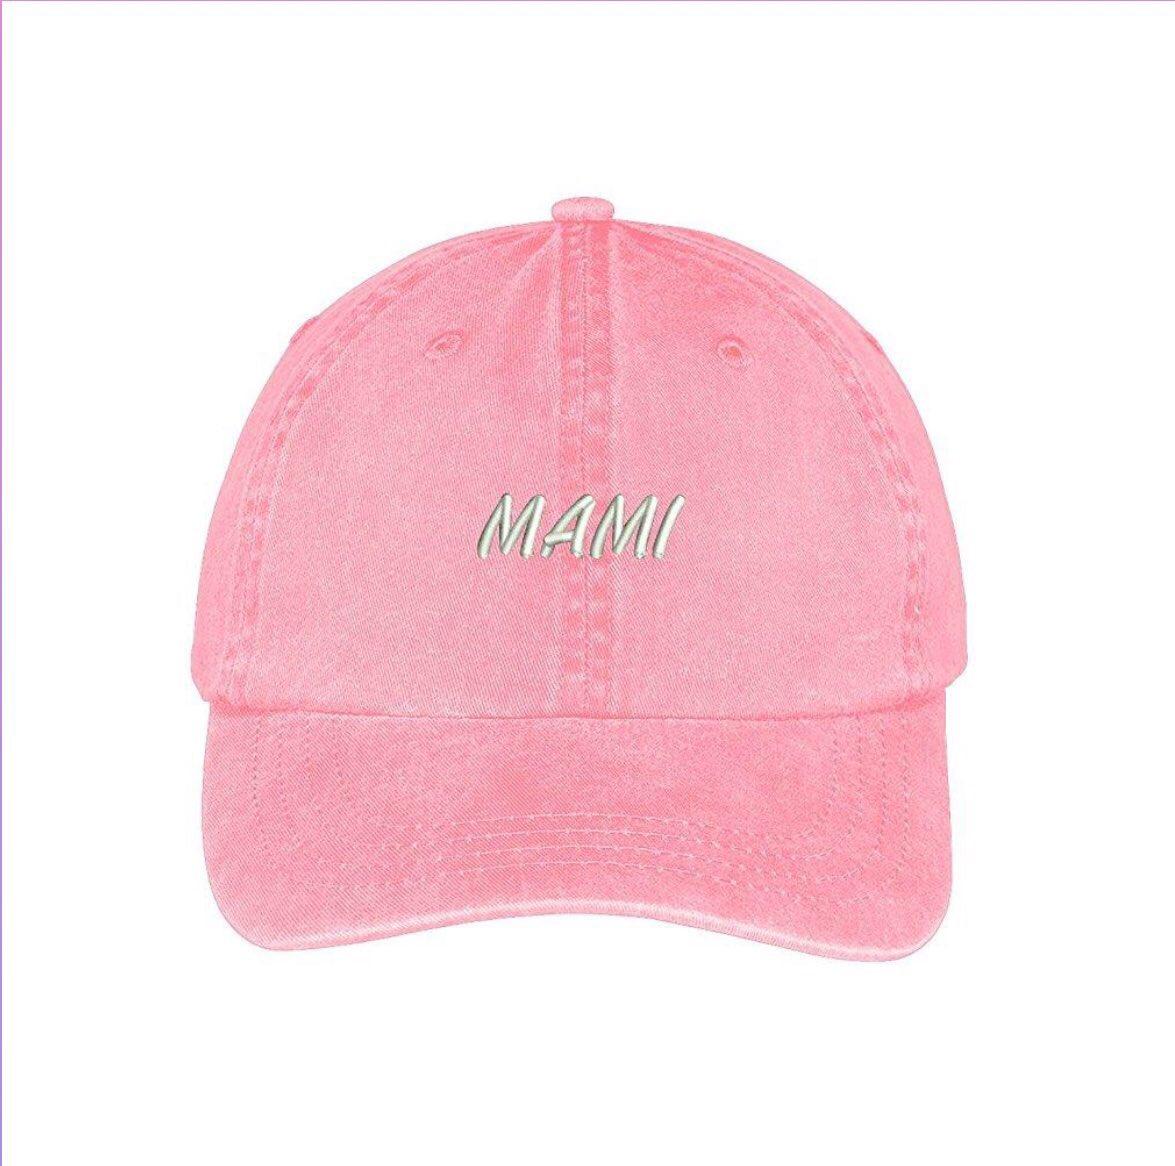 MAMI Dad Hat 💘  Shop: https://t.co/7YDDk...